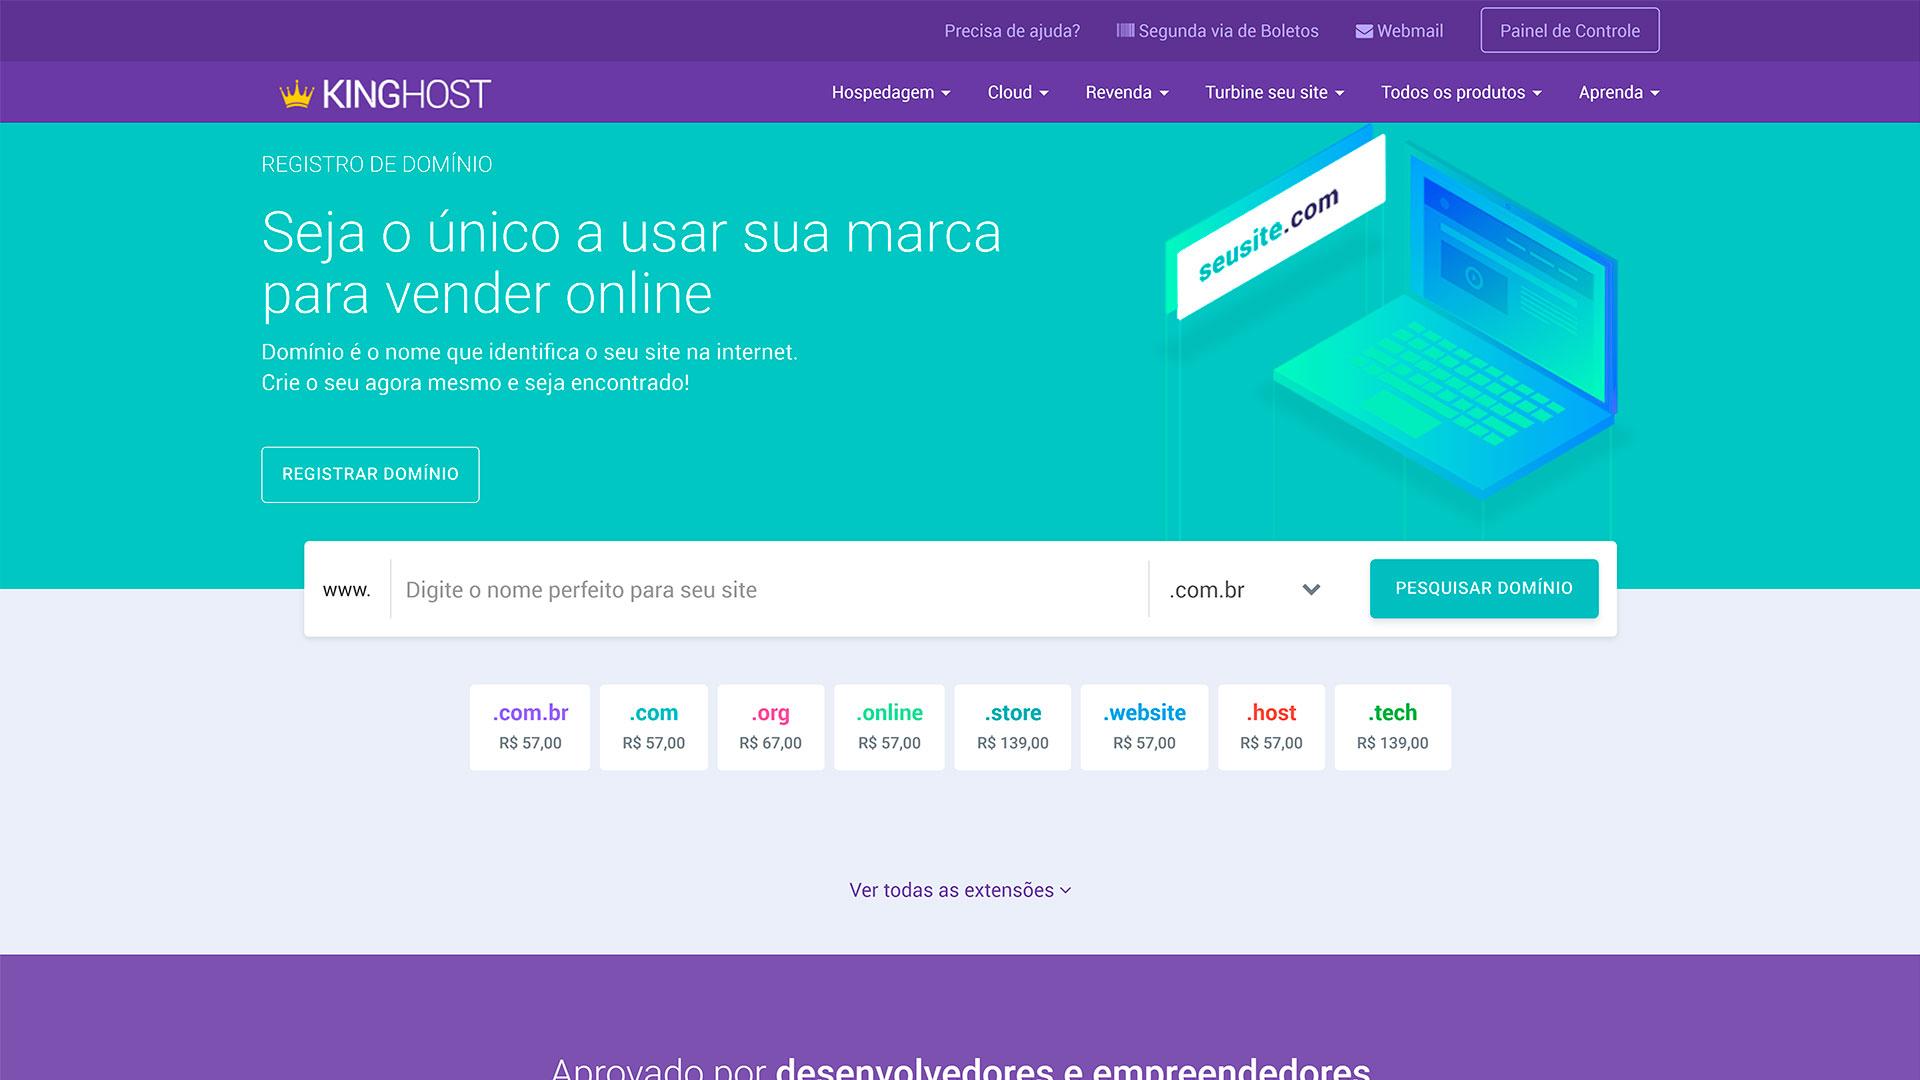 kinghost review registro de dominio